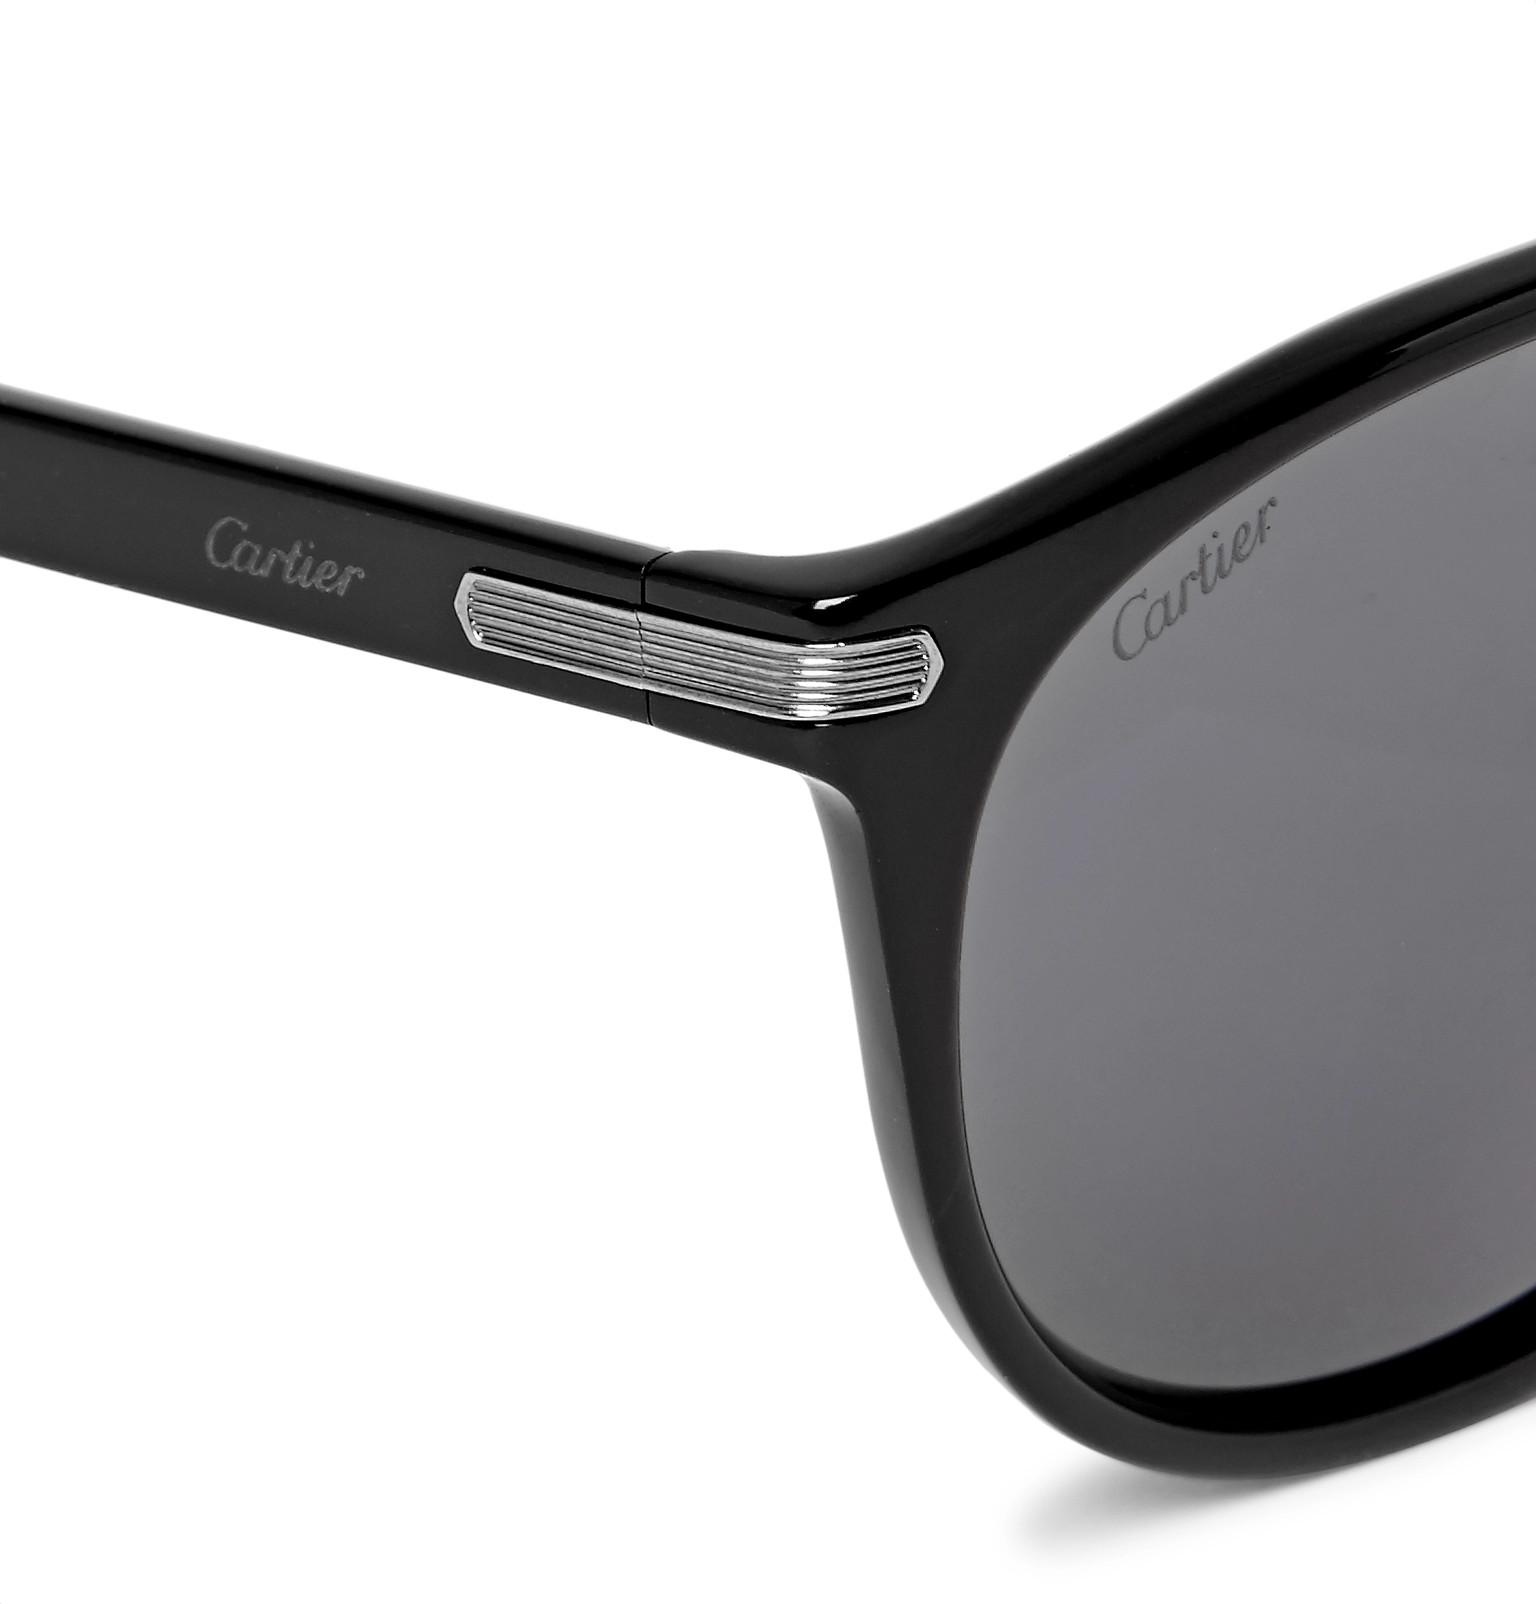 349d517170 Cartier Eyewear - Signature C de Cartier Round-Frame Acetate Sunglasses